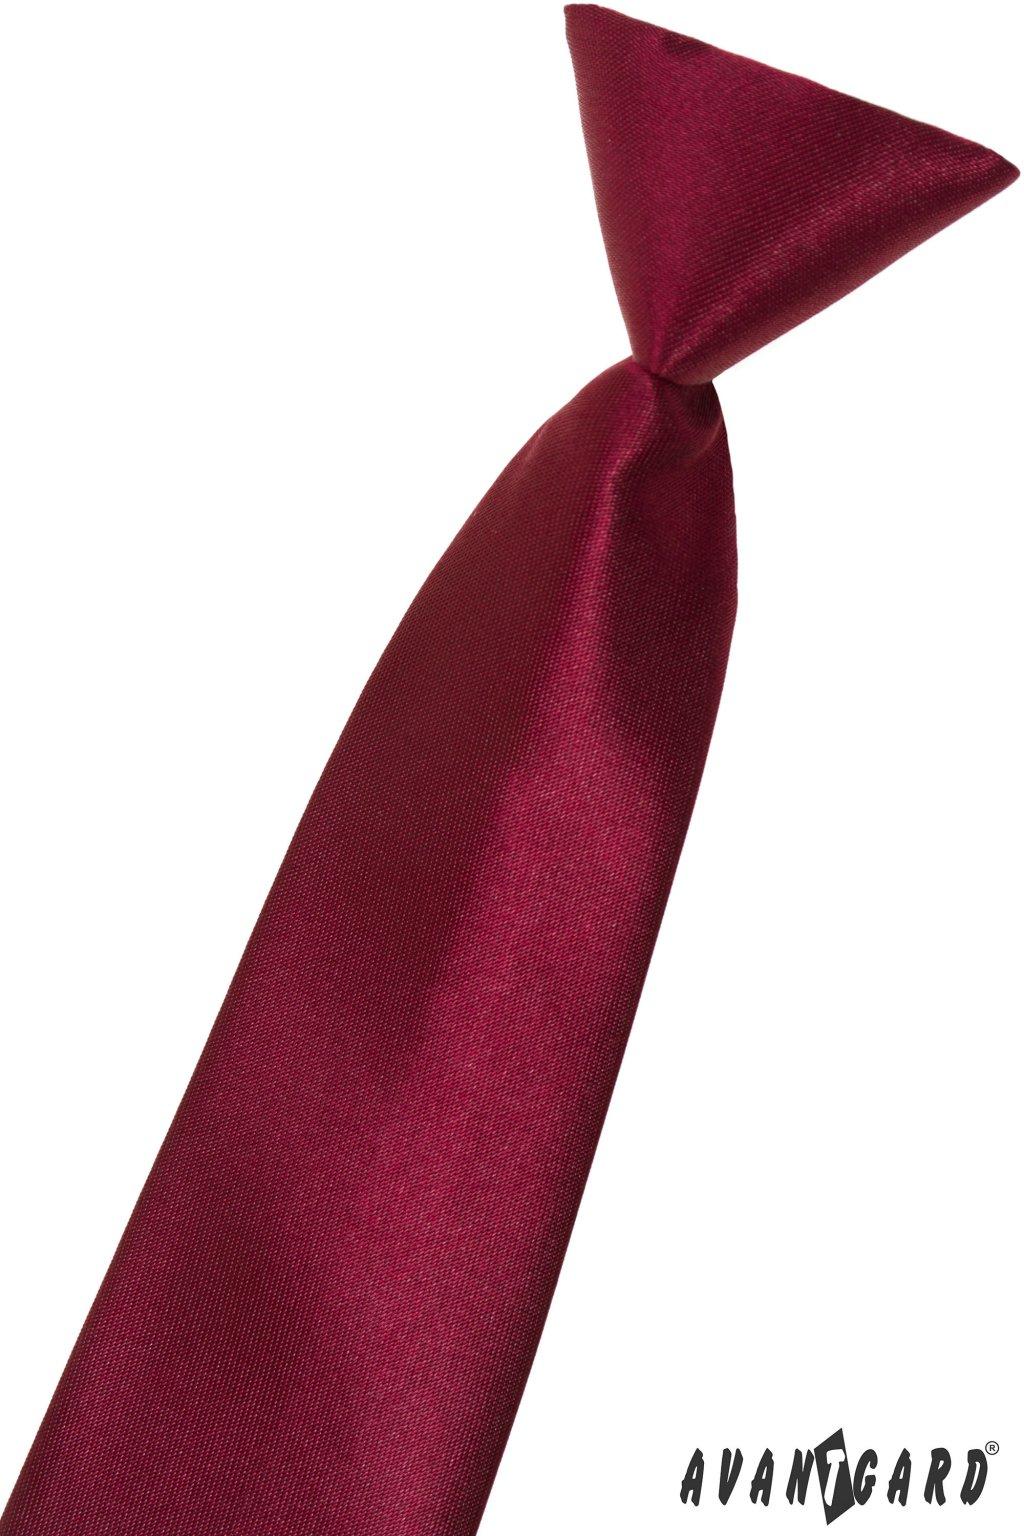 Chlapecká kravata, 558-754, Bordó